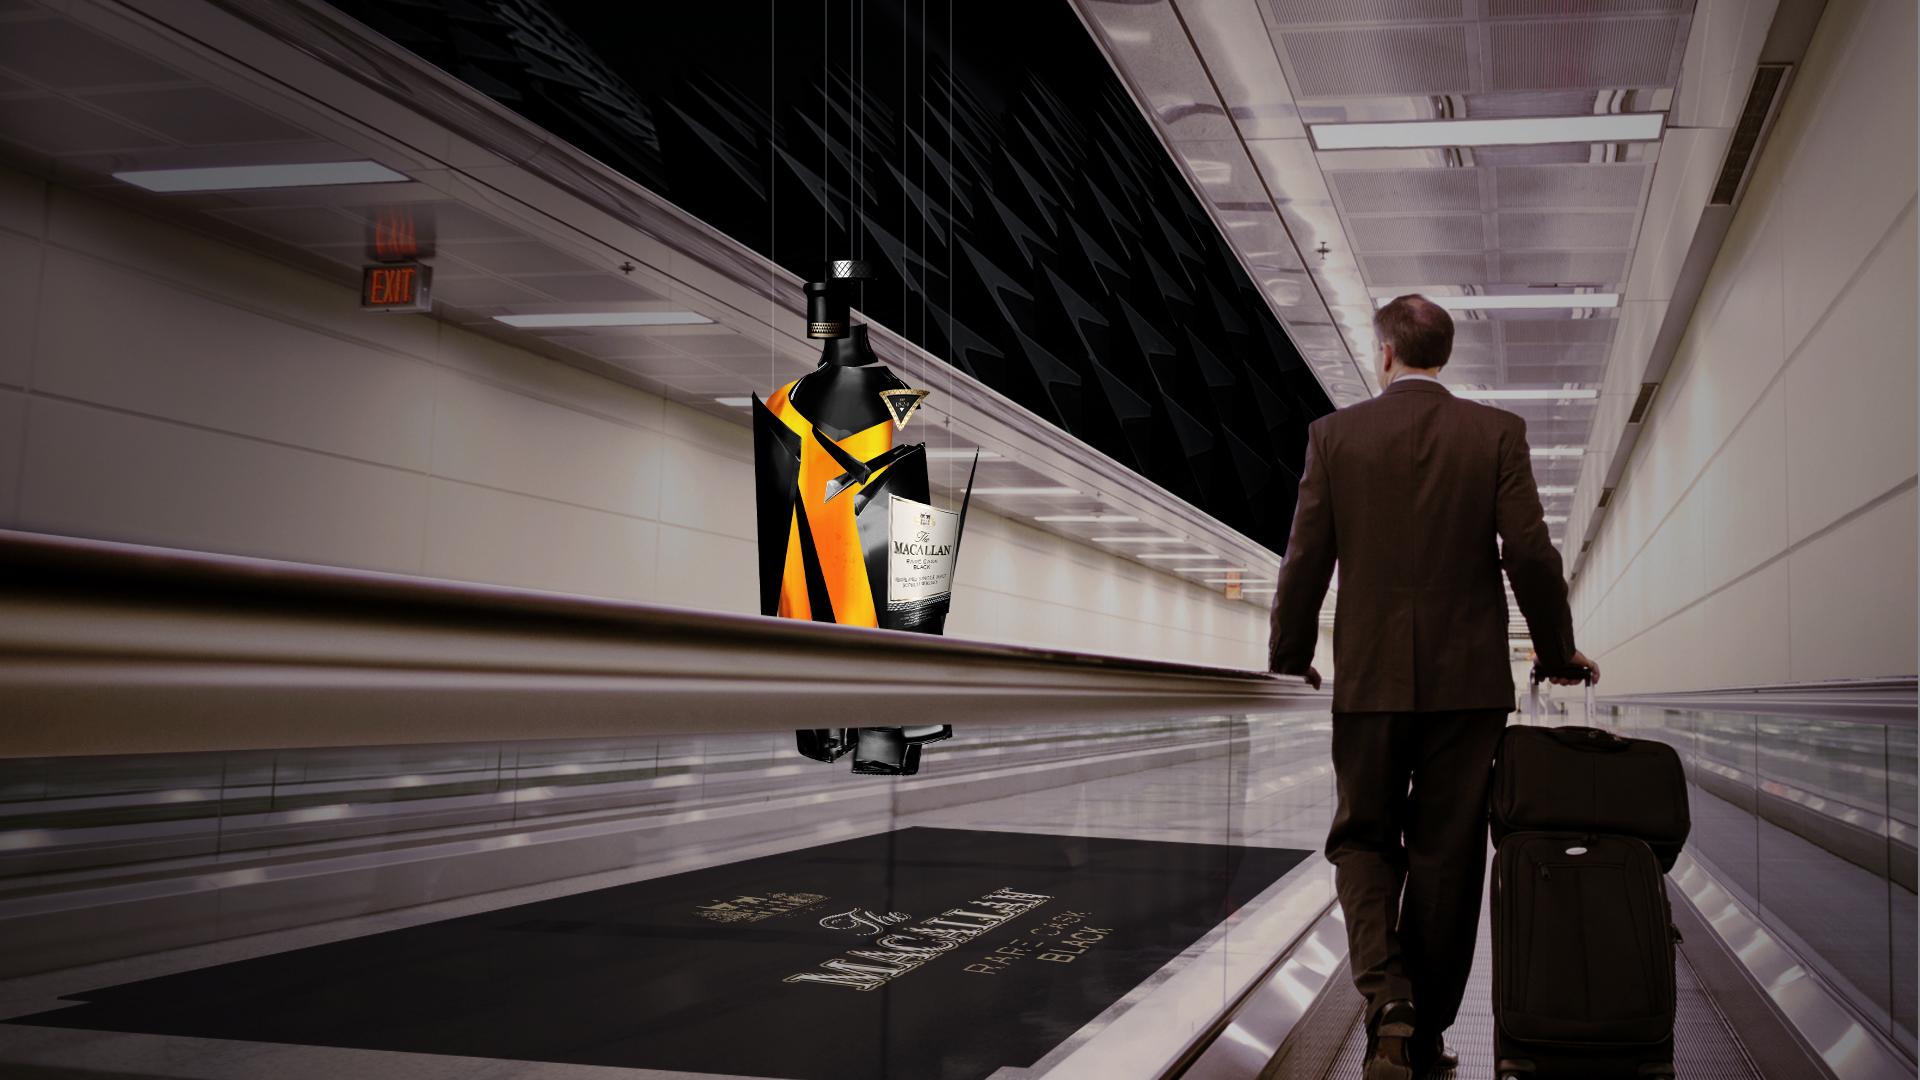 Airport_Lift_01.jpg